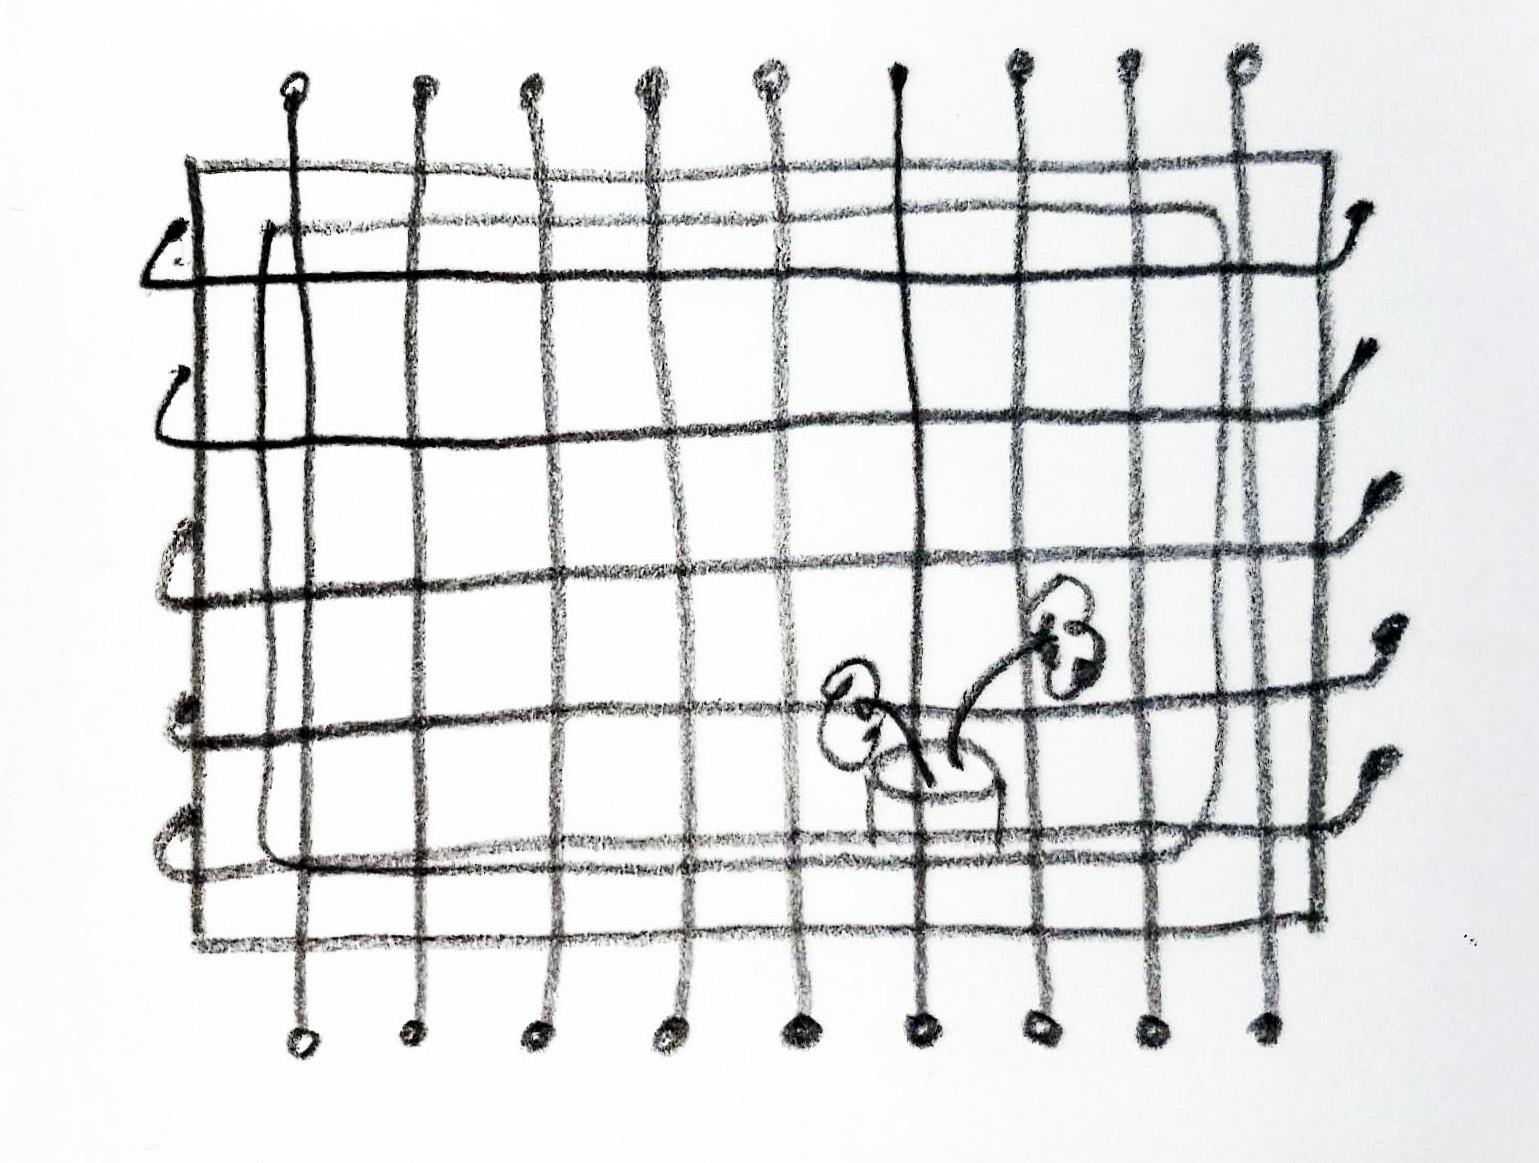 sketch of a prison window